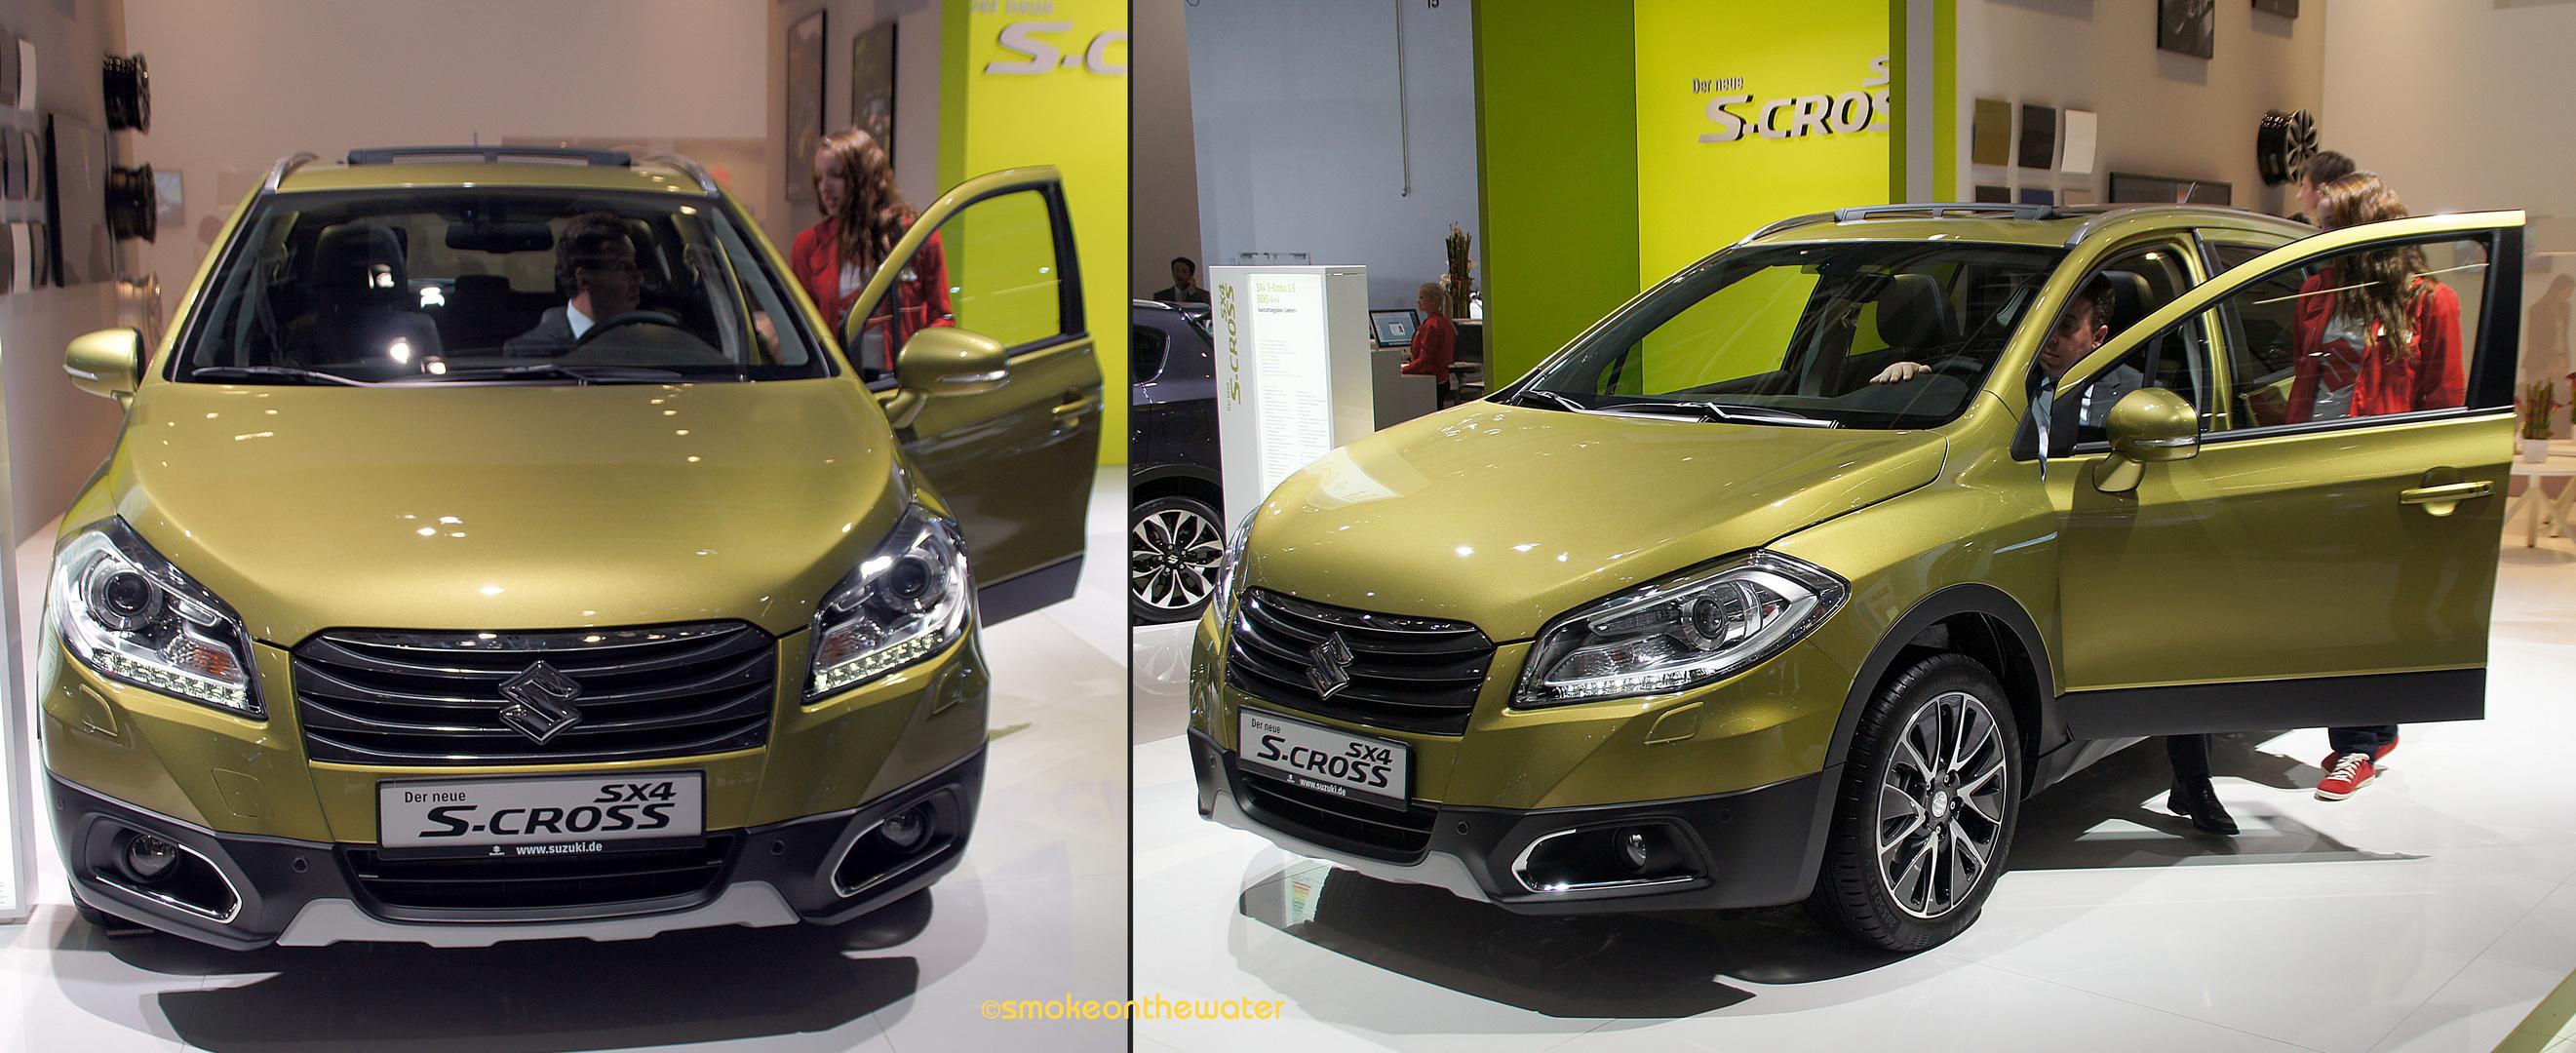 Suzuki SX4 S.Cross